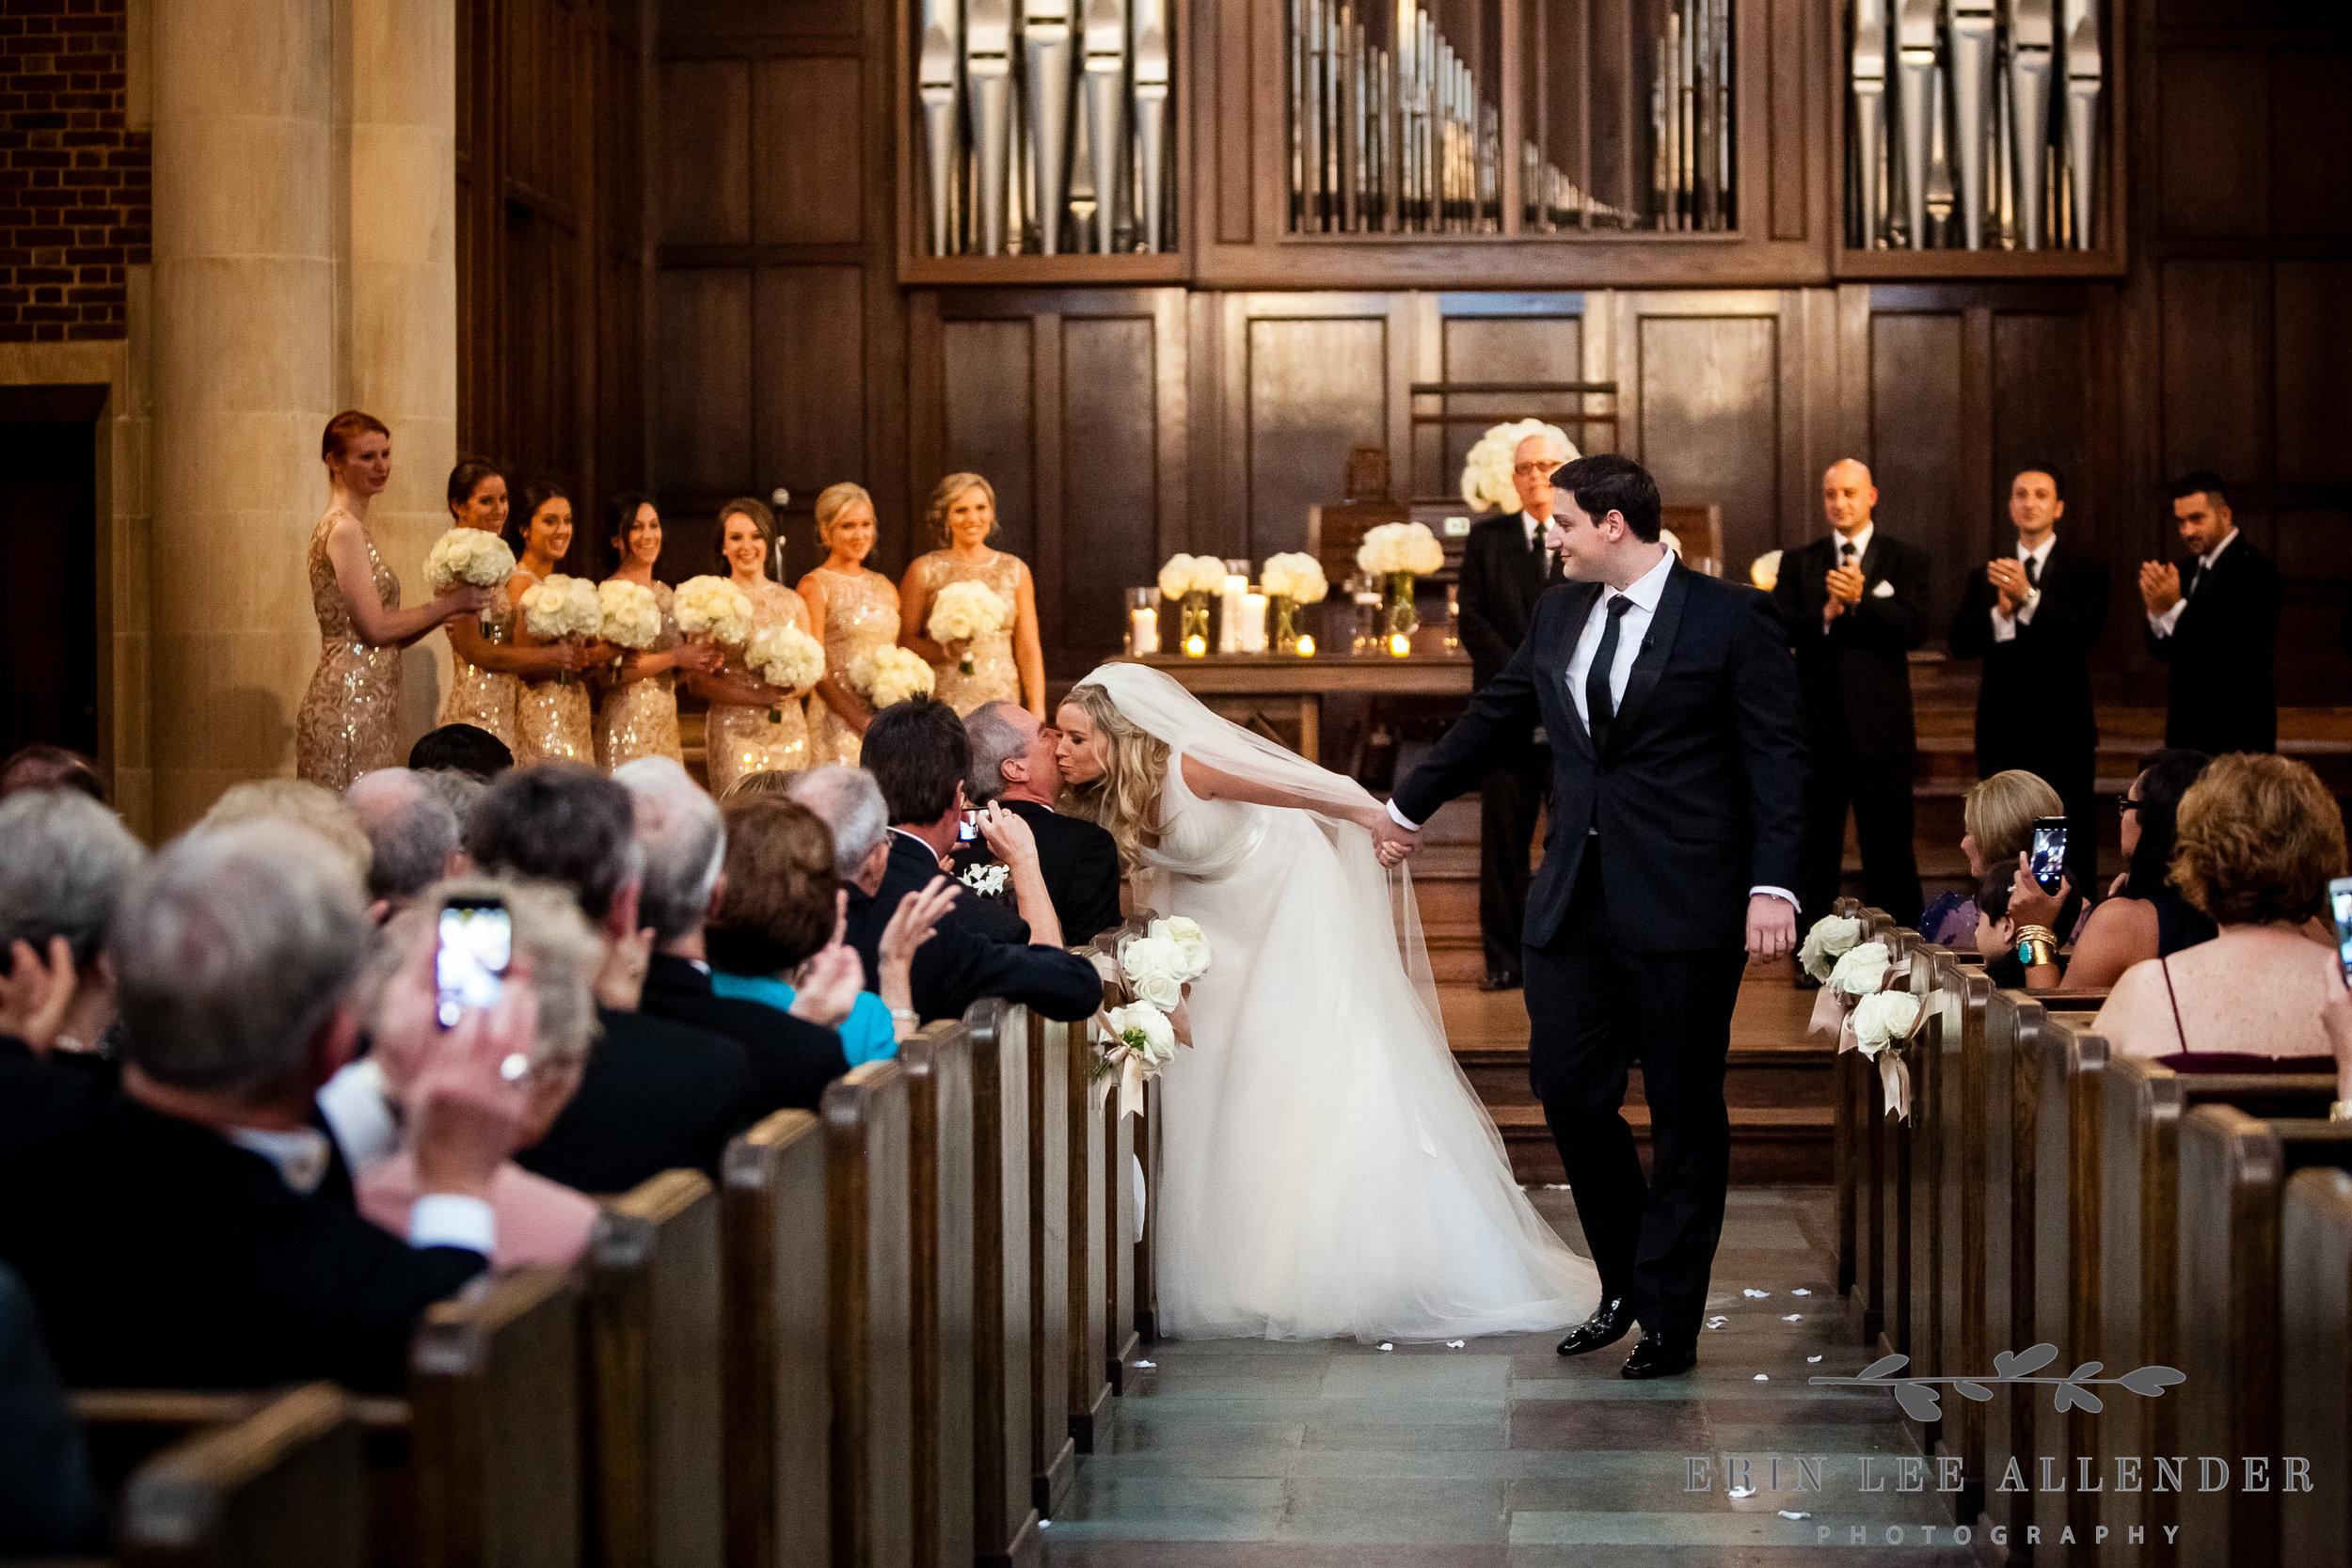 Bride_Kisses_Dad_Walking_Down_Aisle